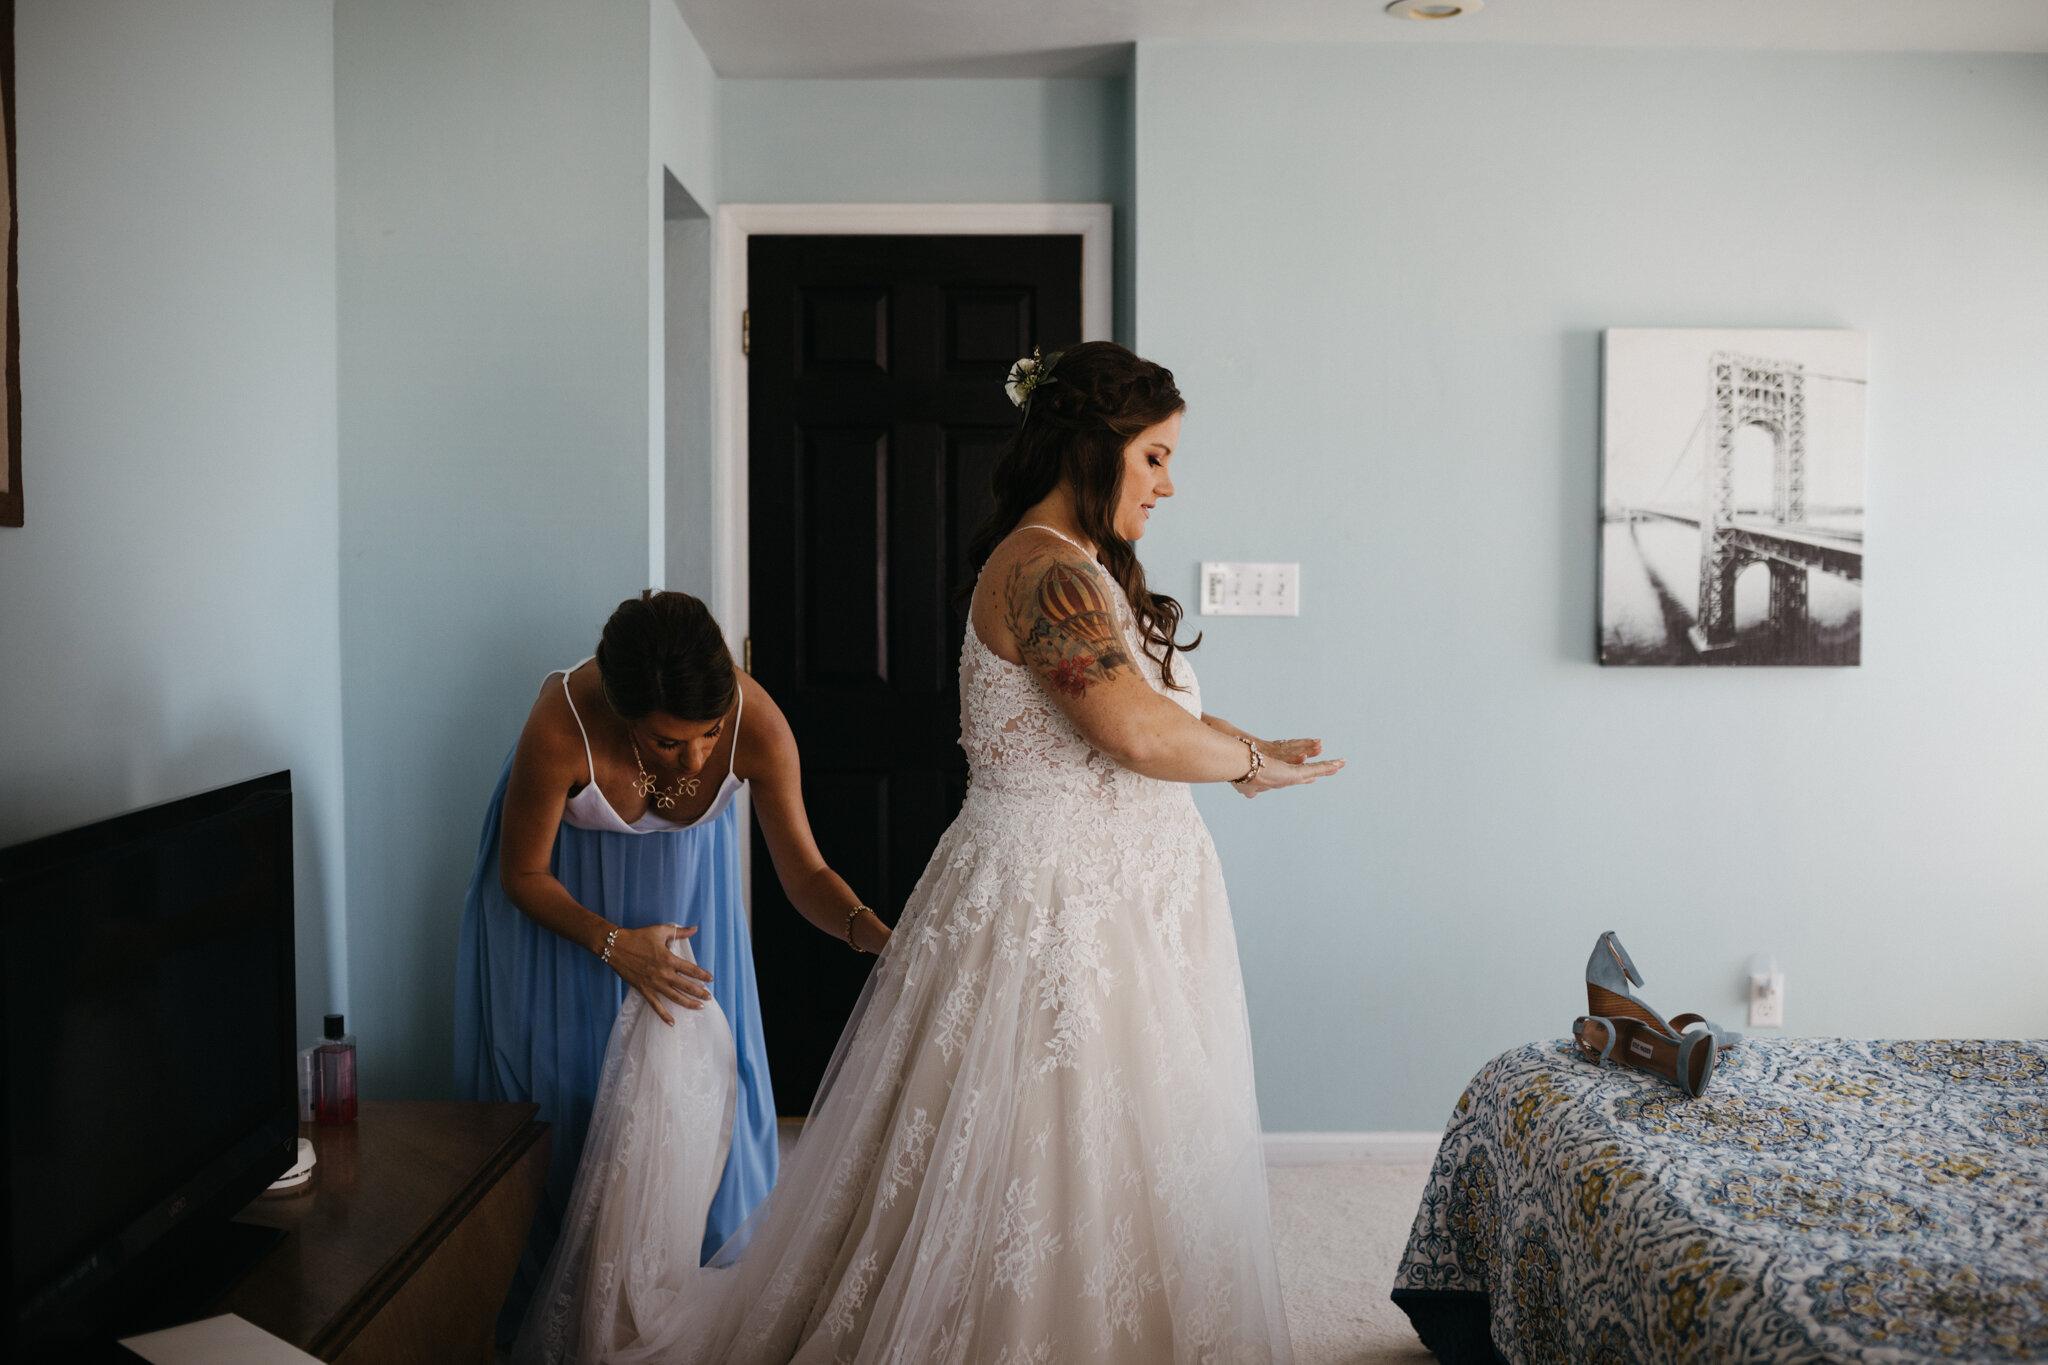 angela_jason_norfolk_wedding-26.jpg